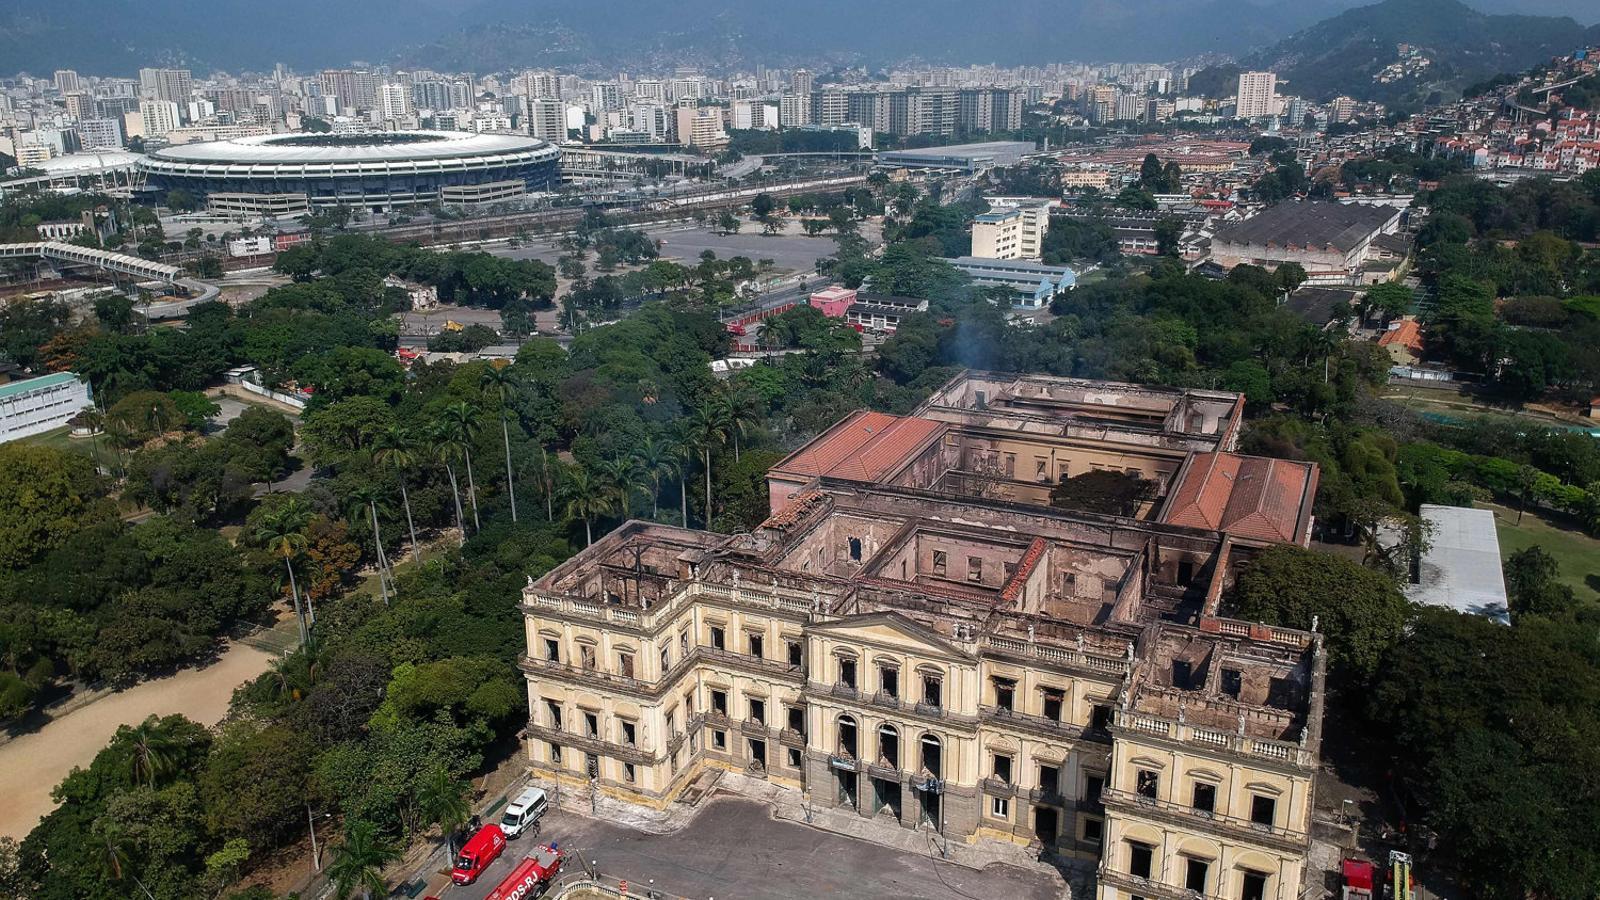 El foc arrasa una part essencial de la memòria del Brasil